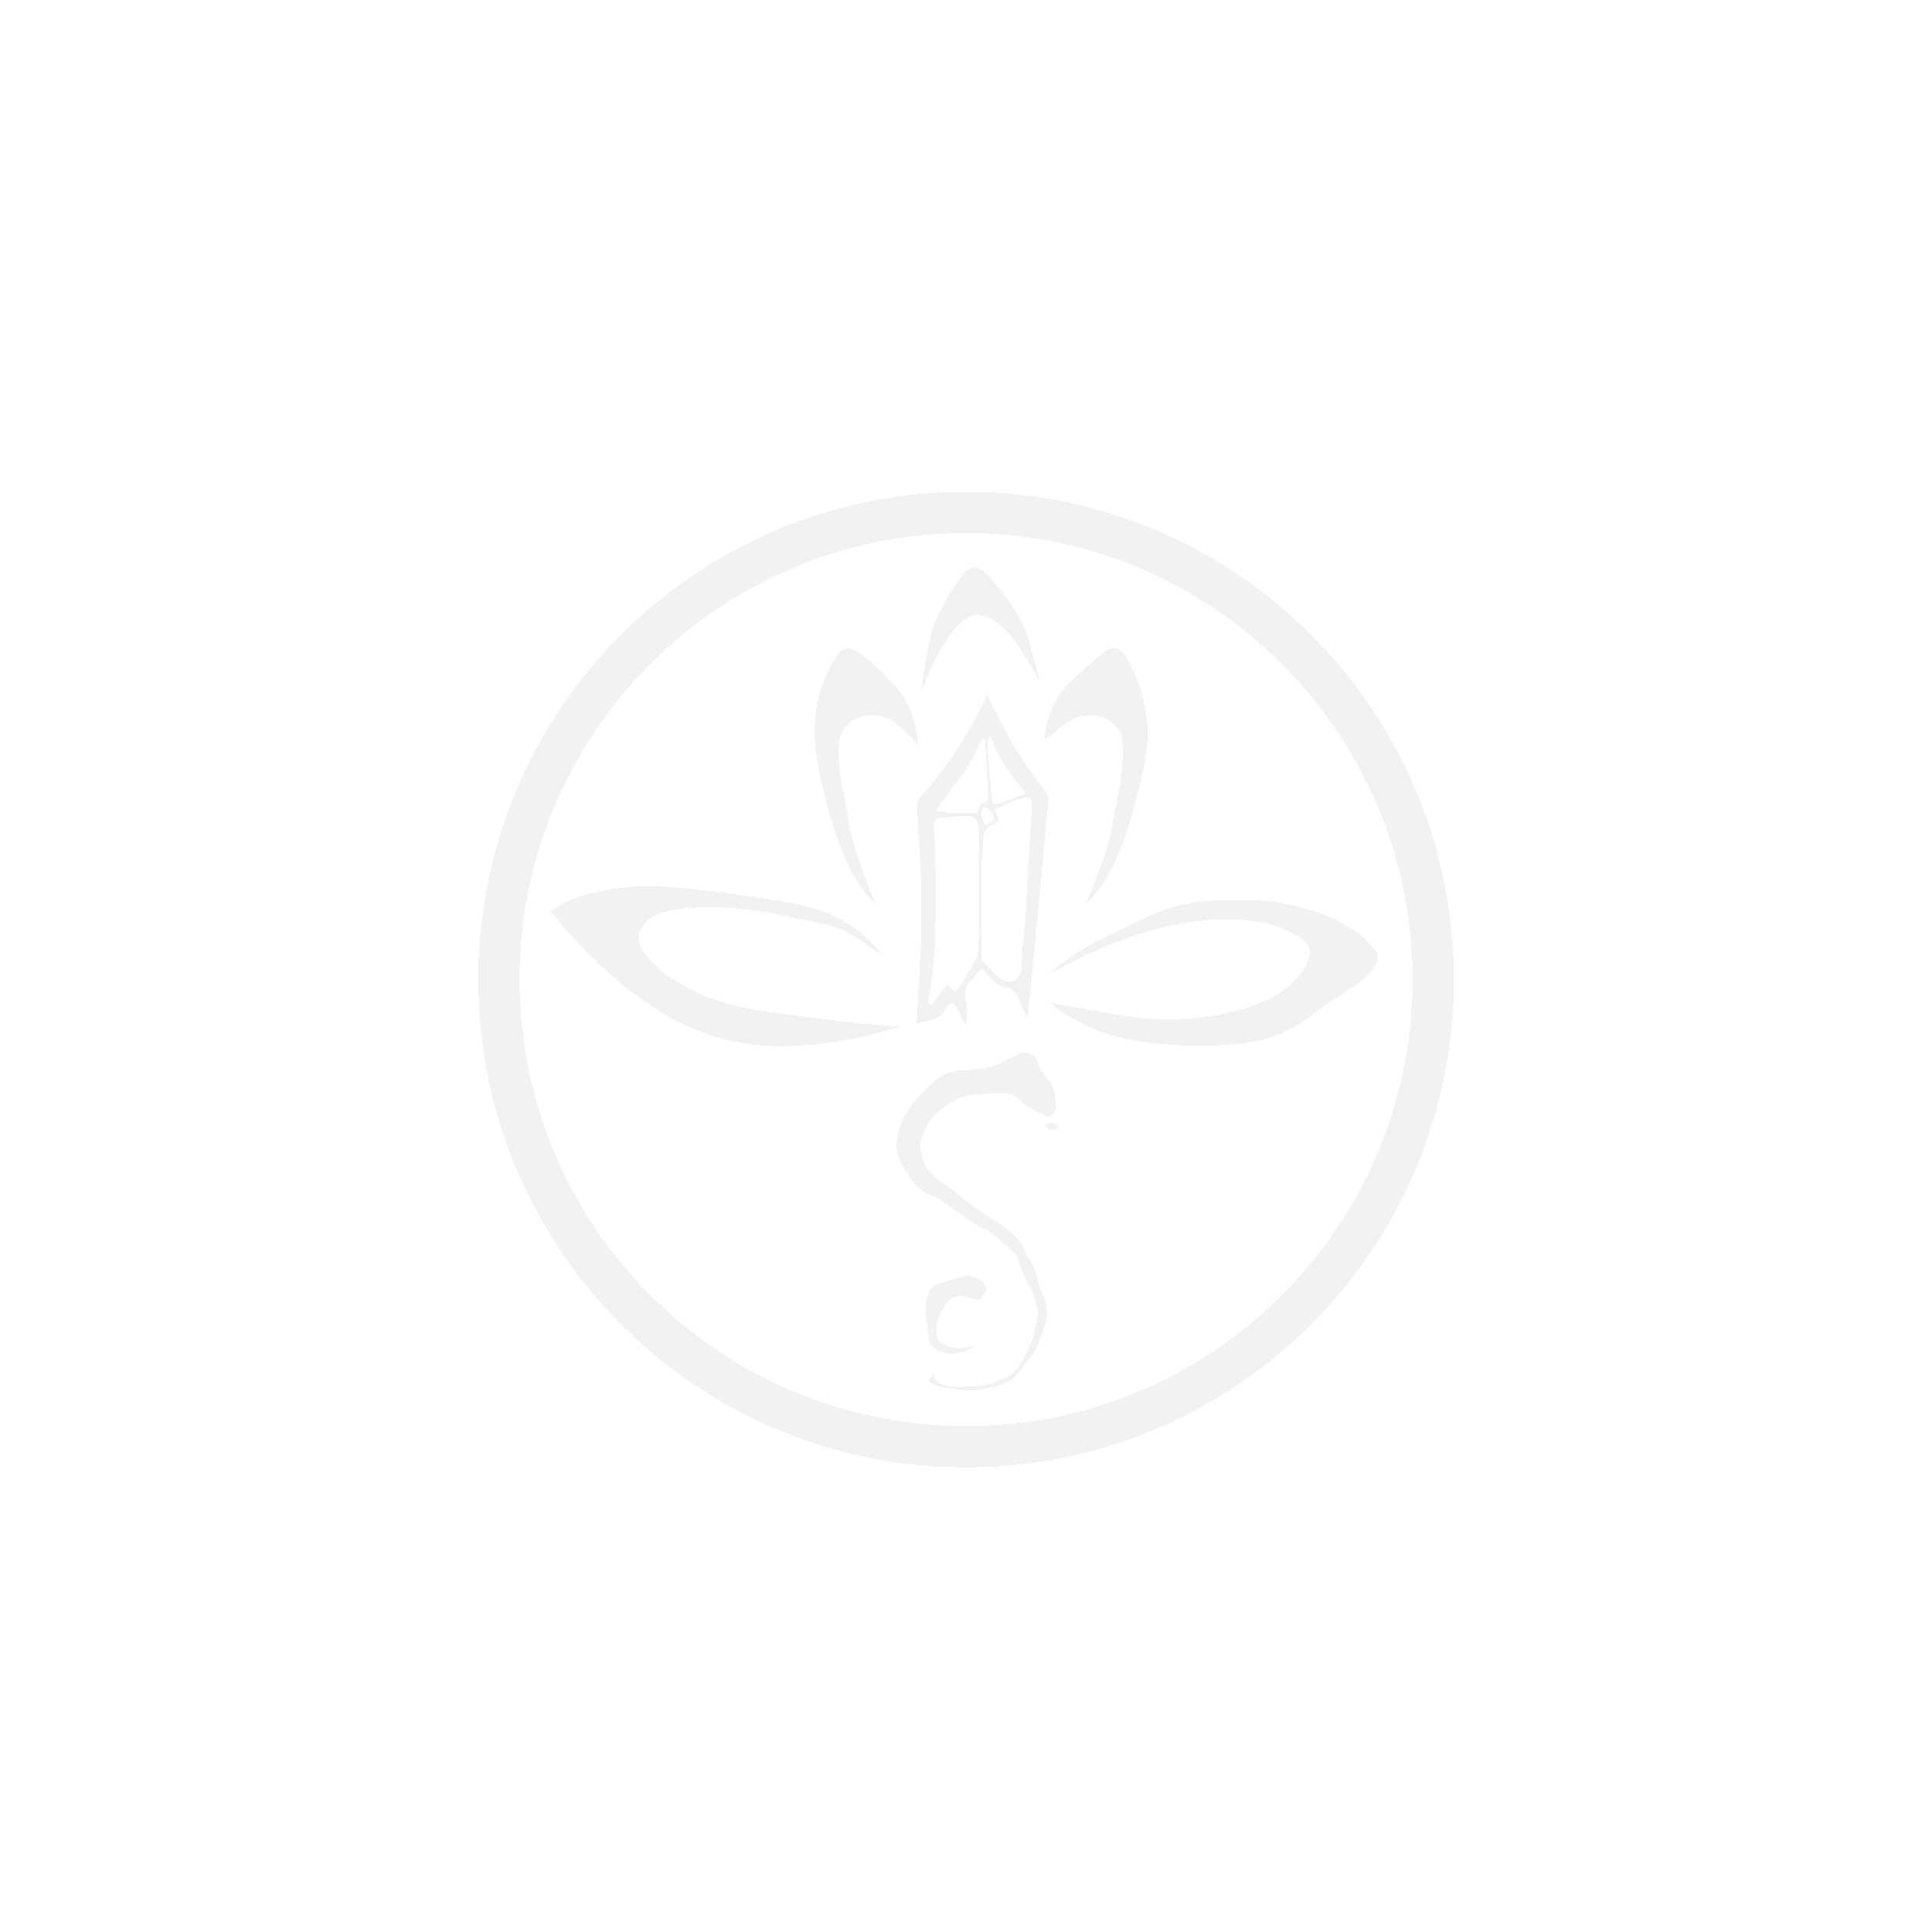 Semente_Cristal_logo.png